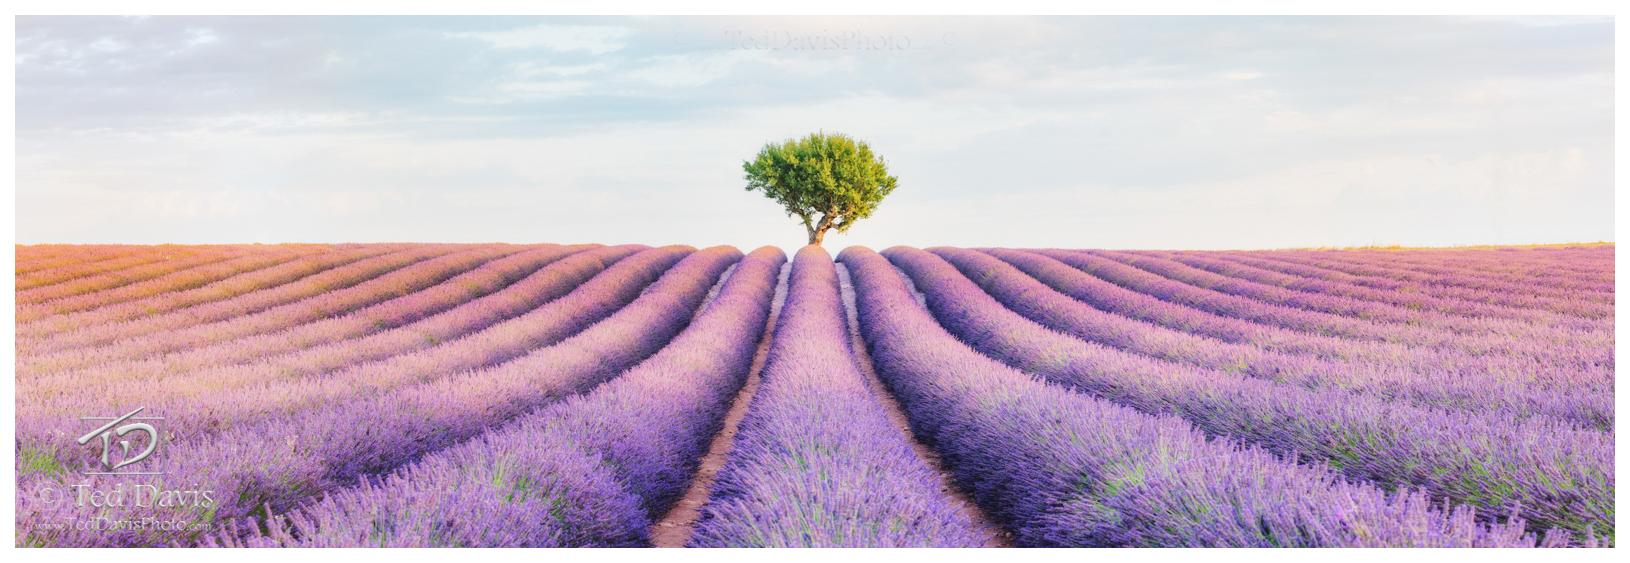 Lavender, glower, alight, provonce, france, shutter, timeless, moment, photo